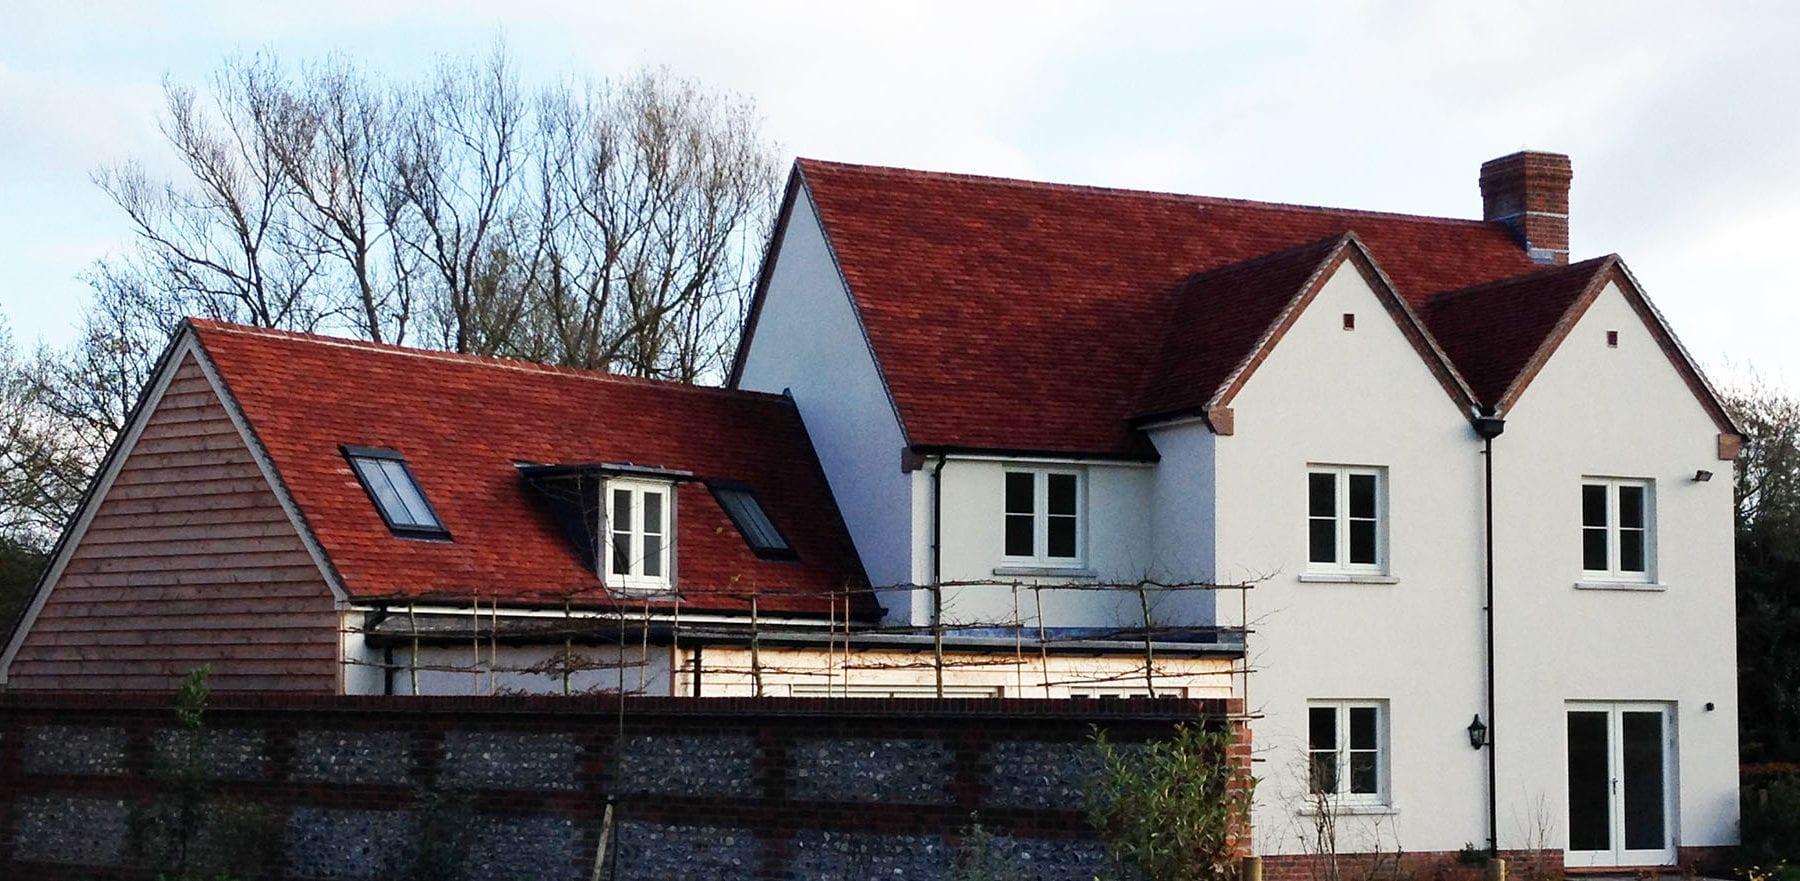 Lifestiles - Handmade Heather Clay Roof Tiles - Salisbury, England 2